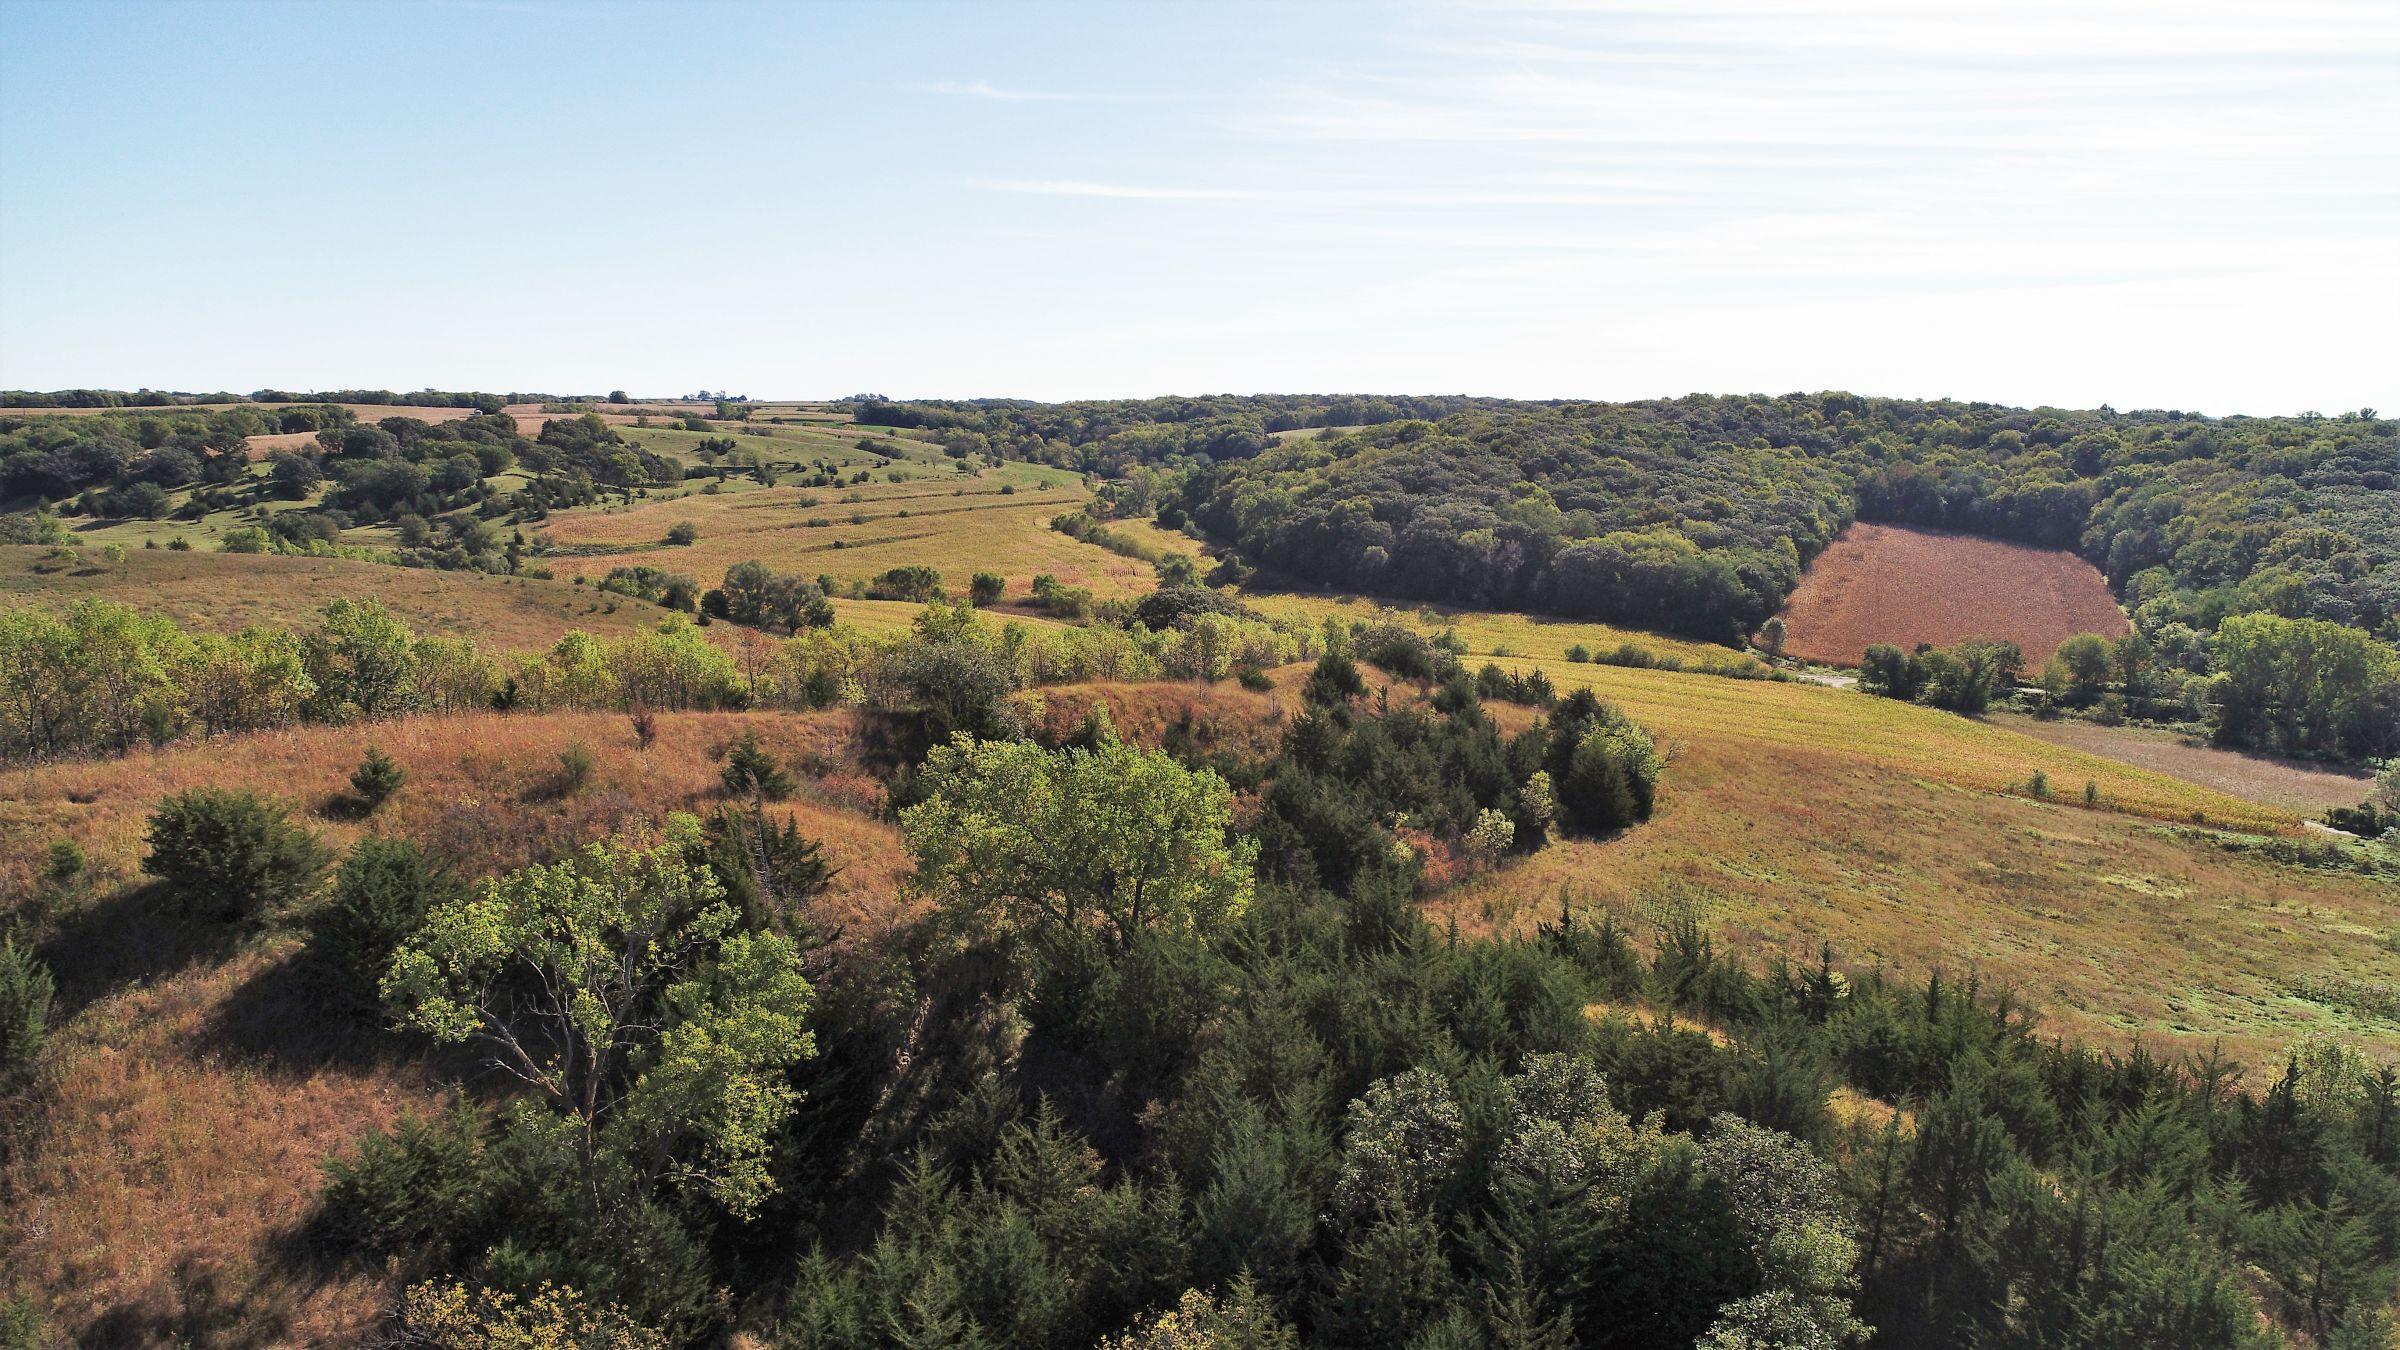 land-harrison-county-iowa-59-acres-listing-number-15527-0-2021-05-21-212625.JPG